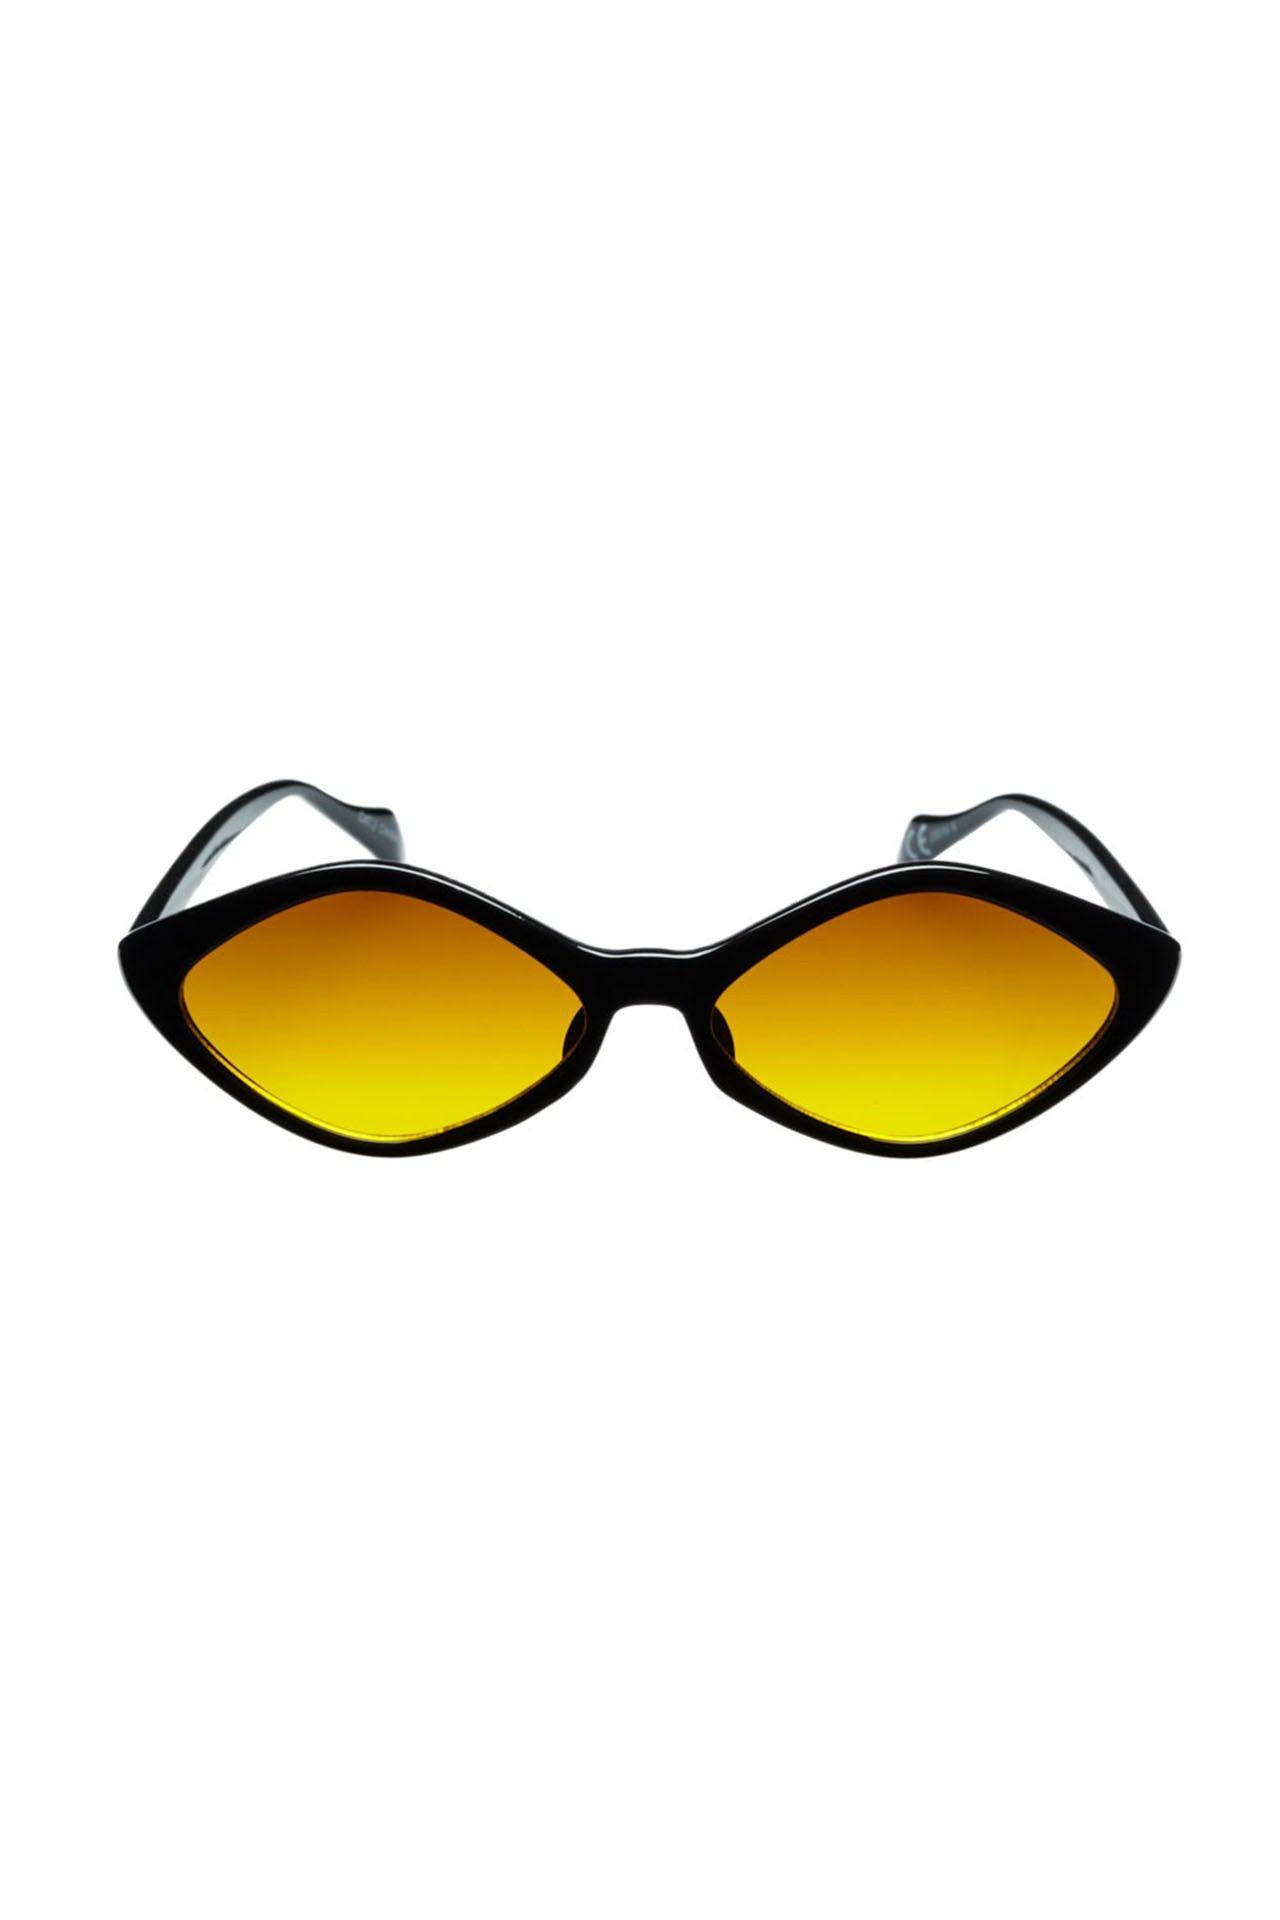 Afbeelding van Icon Eyewear Zonnebril 20014 Black A